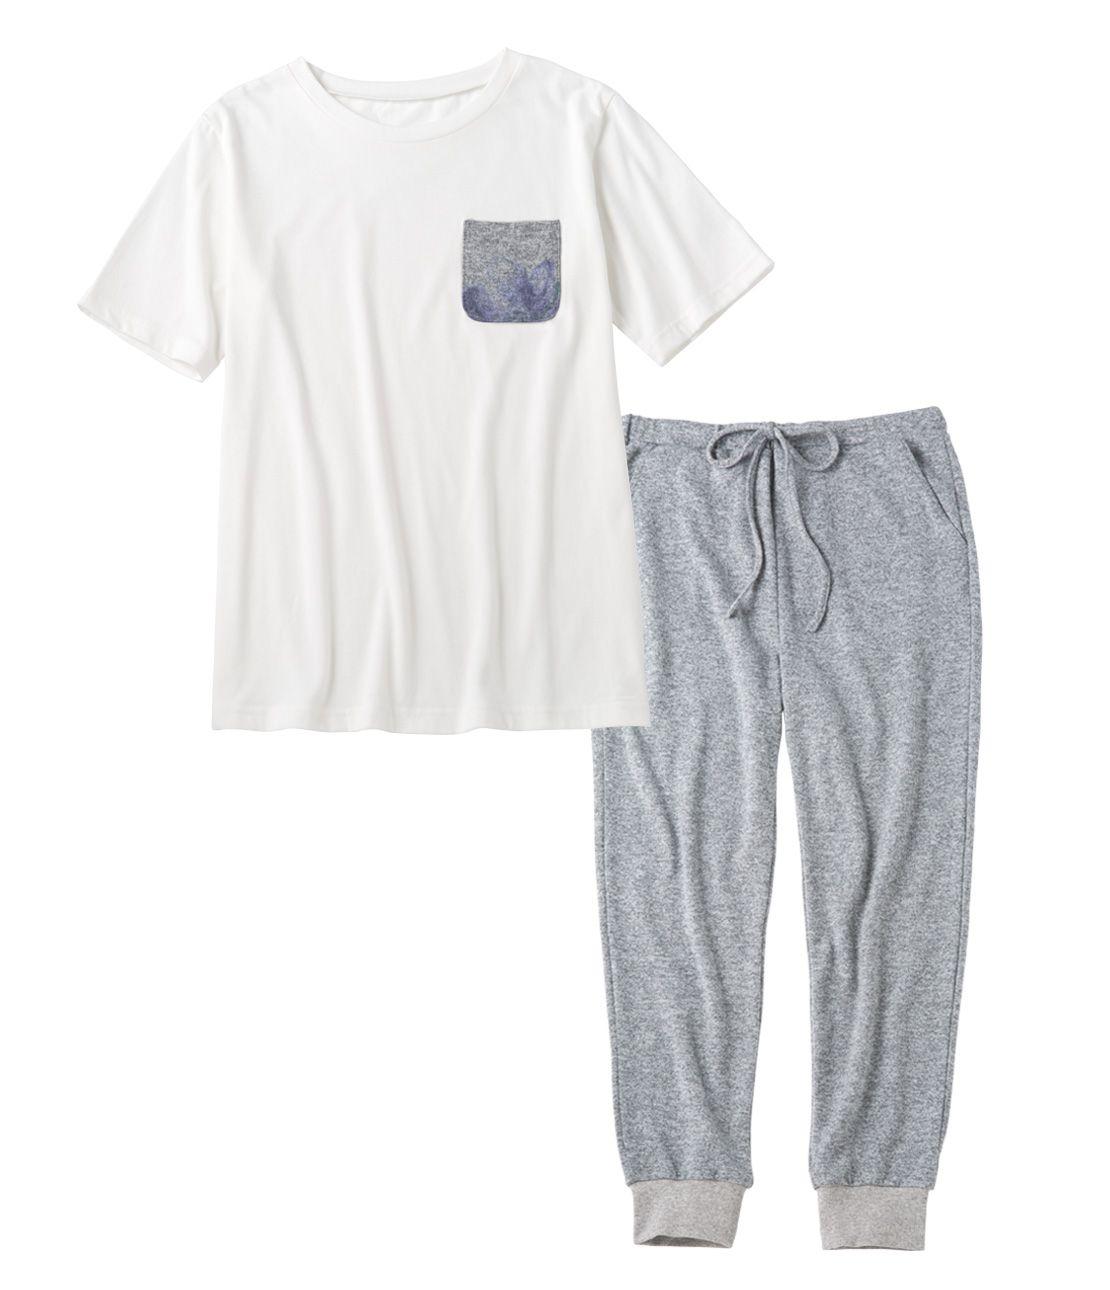 ■ ROLA'S FAVORITE Men's pajamas